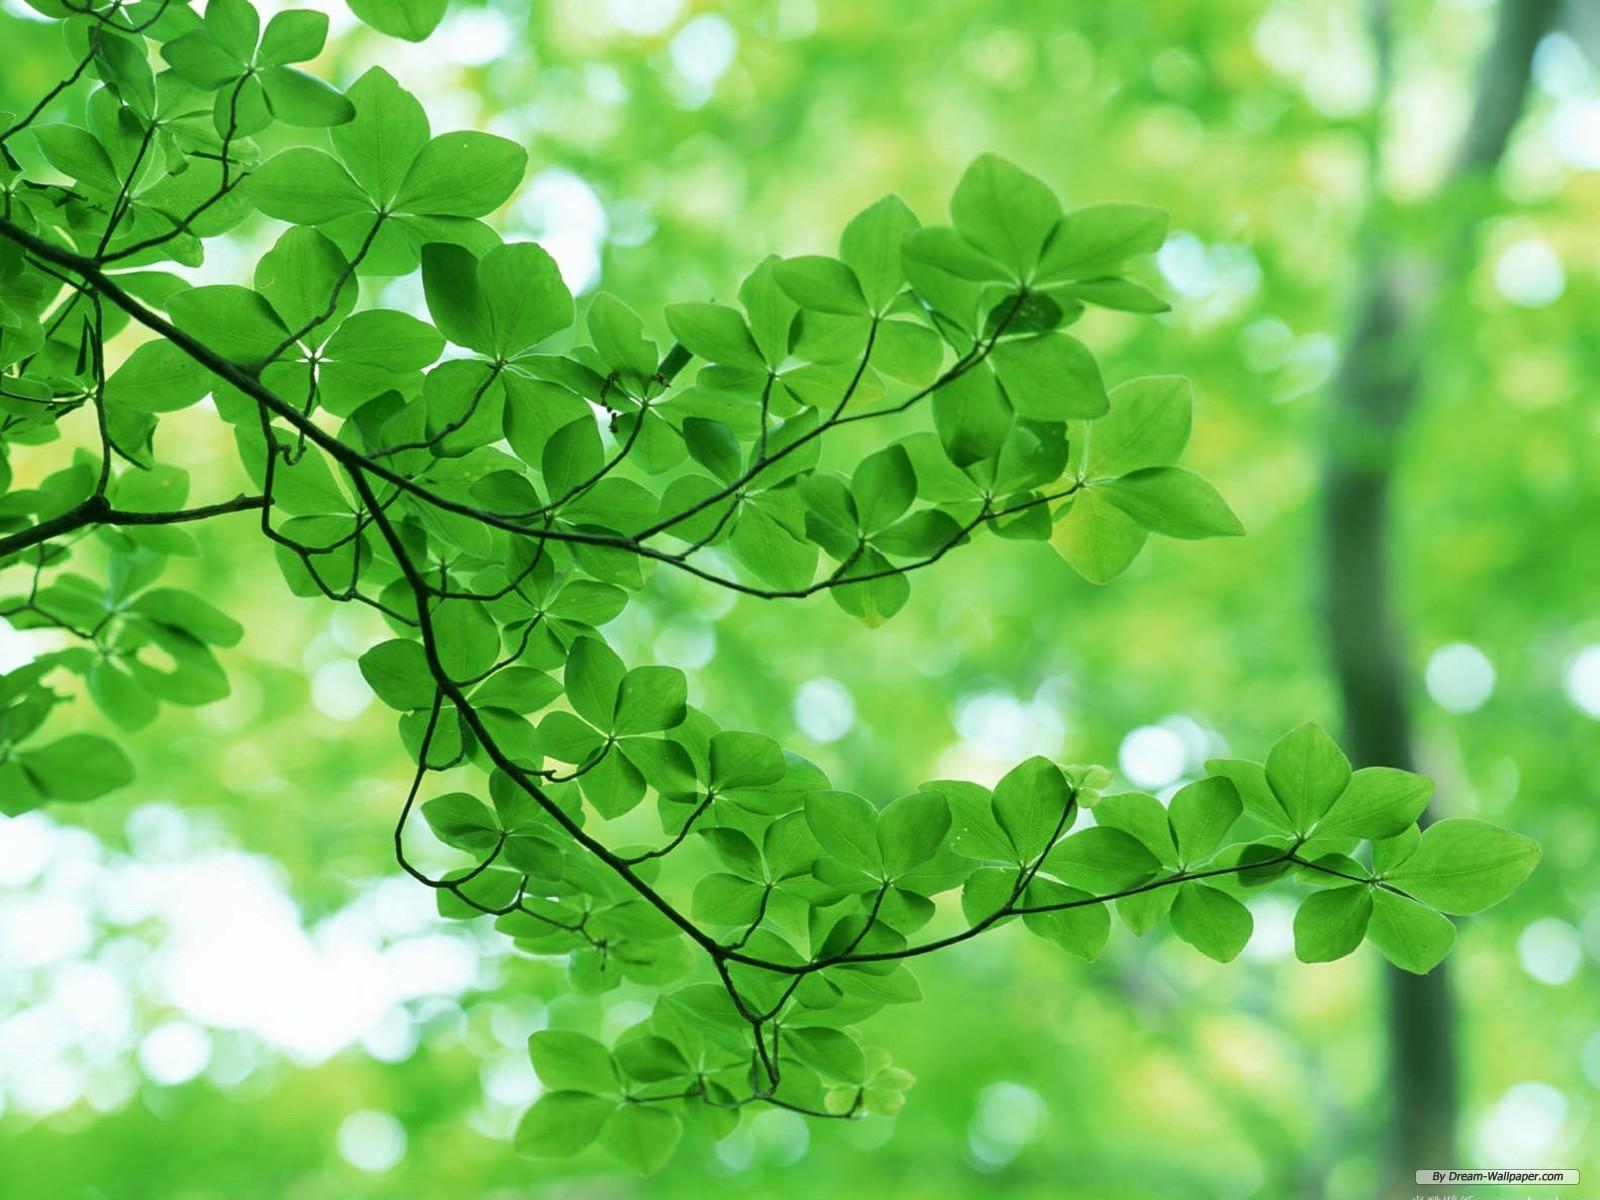 Free Wallpaper - Free Nature wallpaper - Green Leaf 2 wallpaper ...